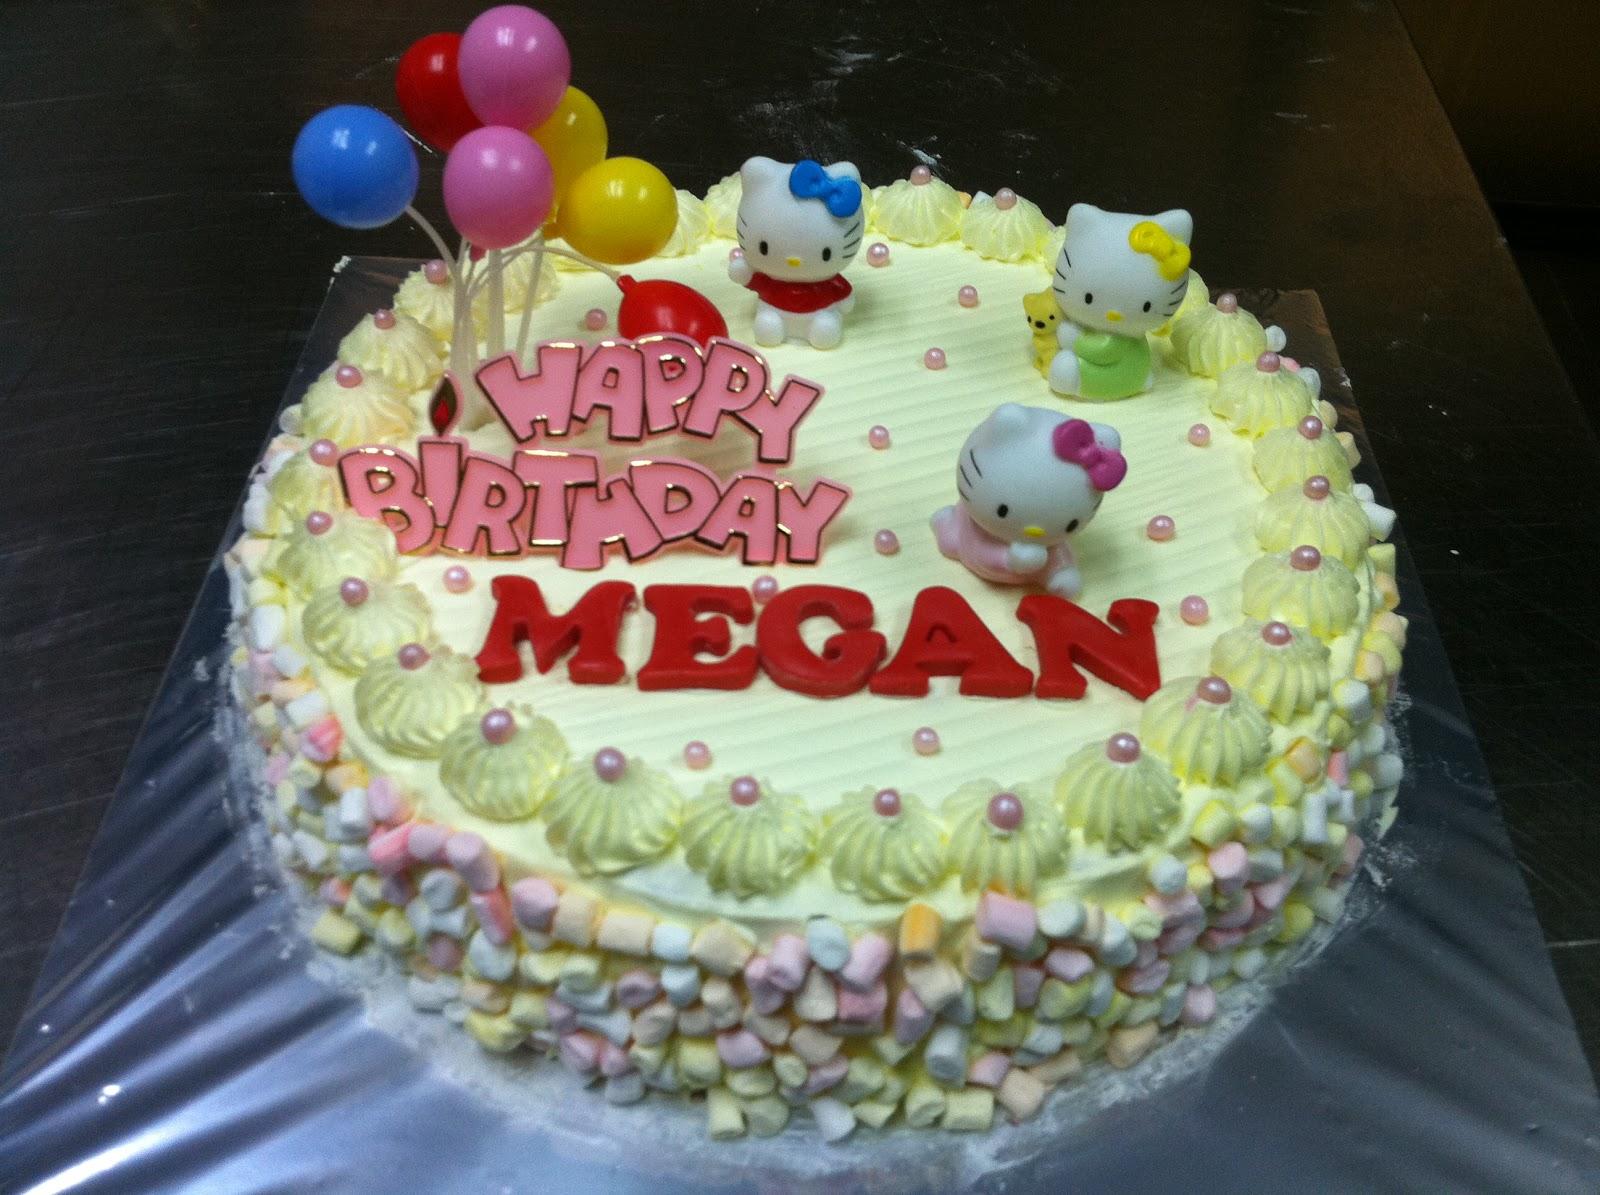 Megan Birthday Cakes